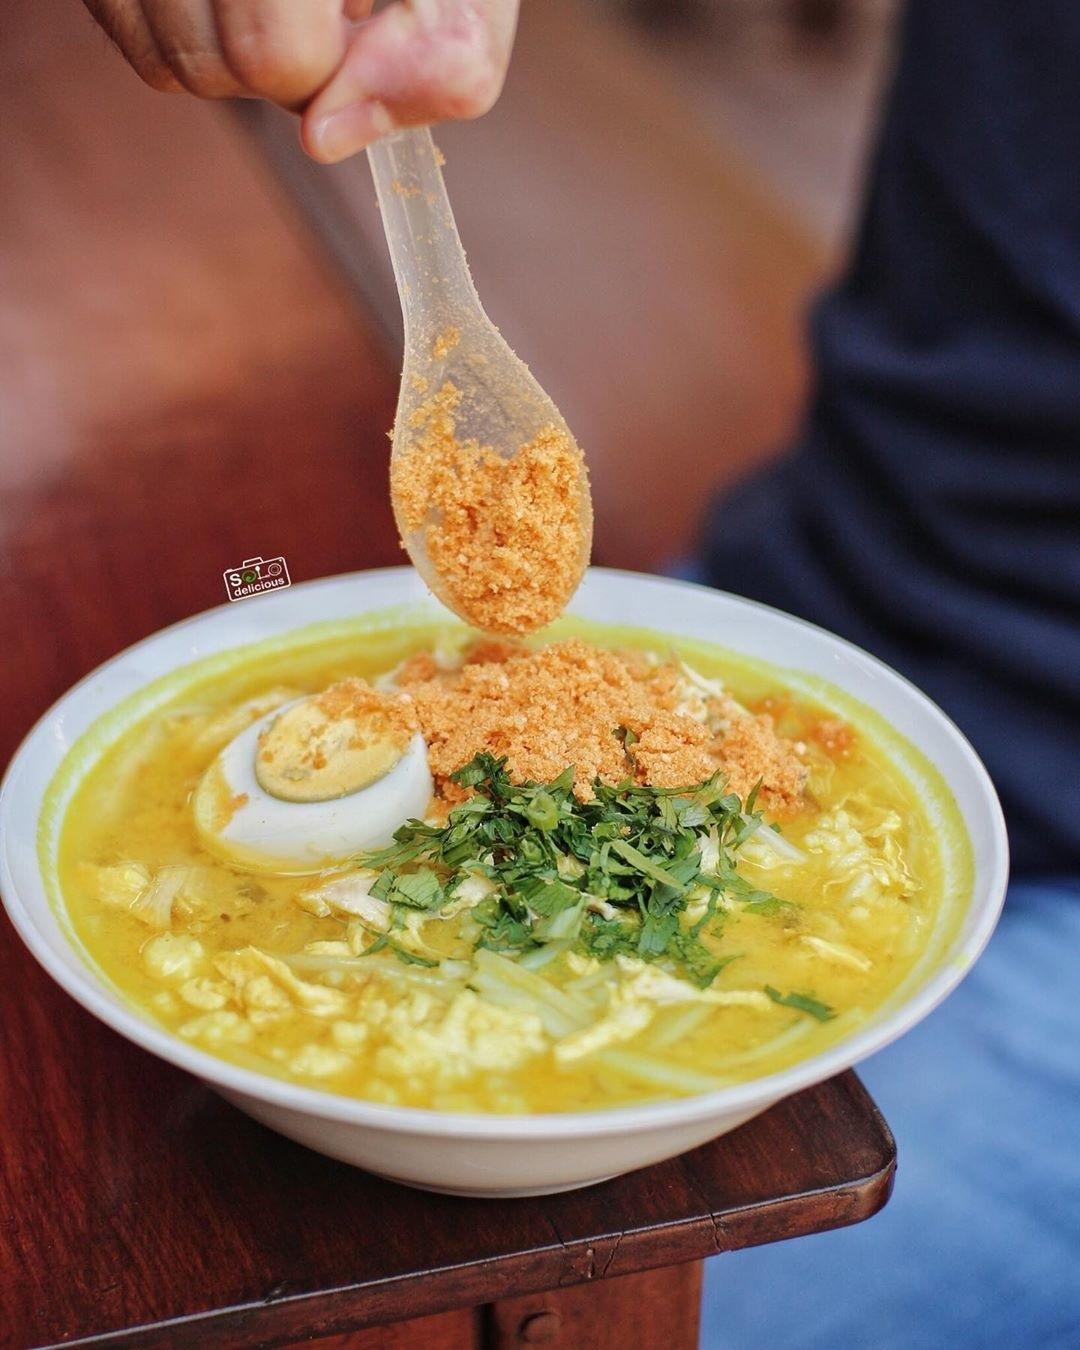 Wisata Kuliner Soto Lamongan Cah Har Surabaya